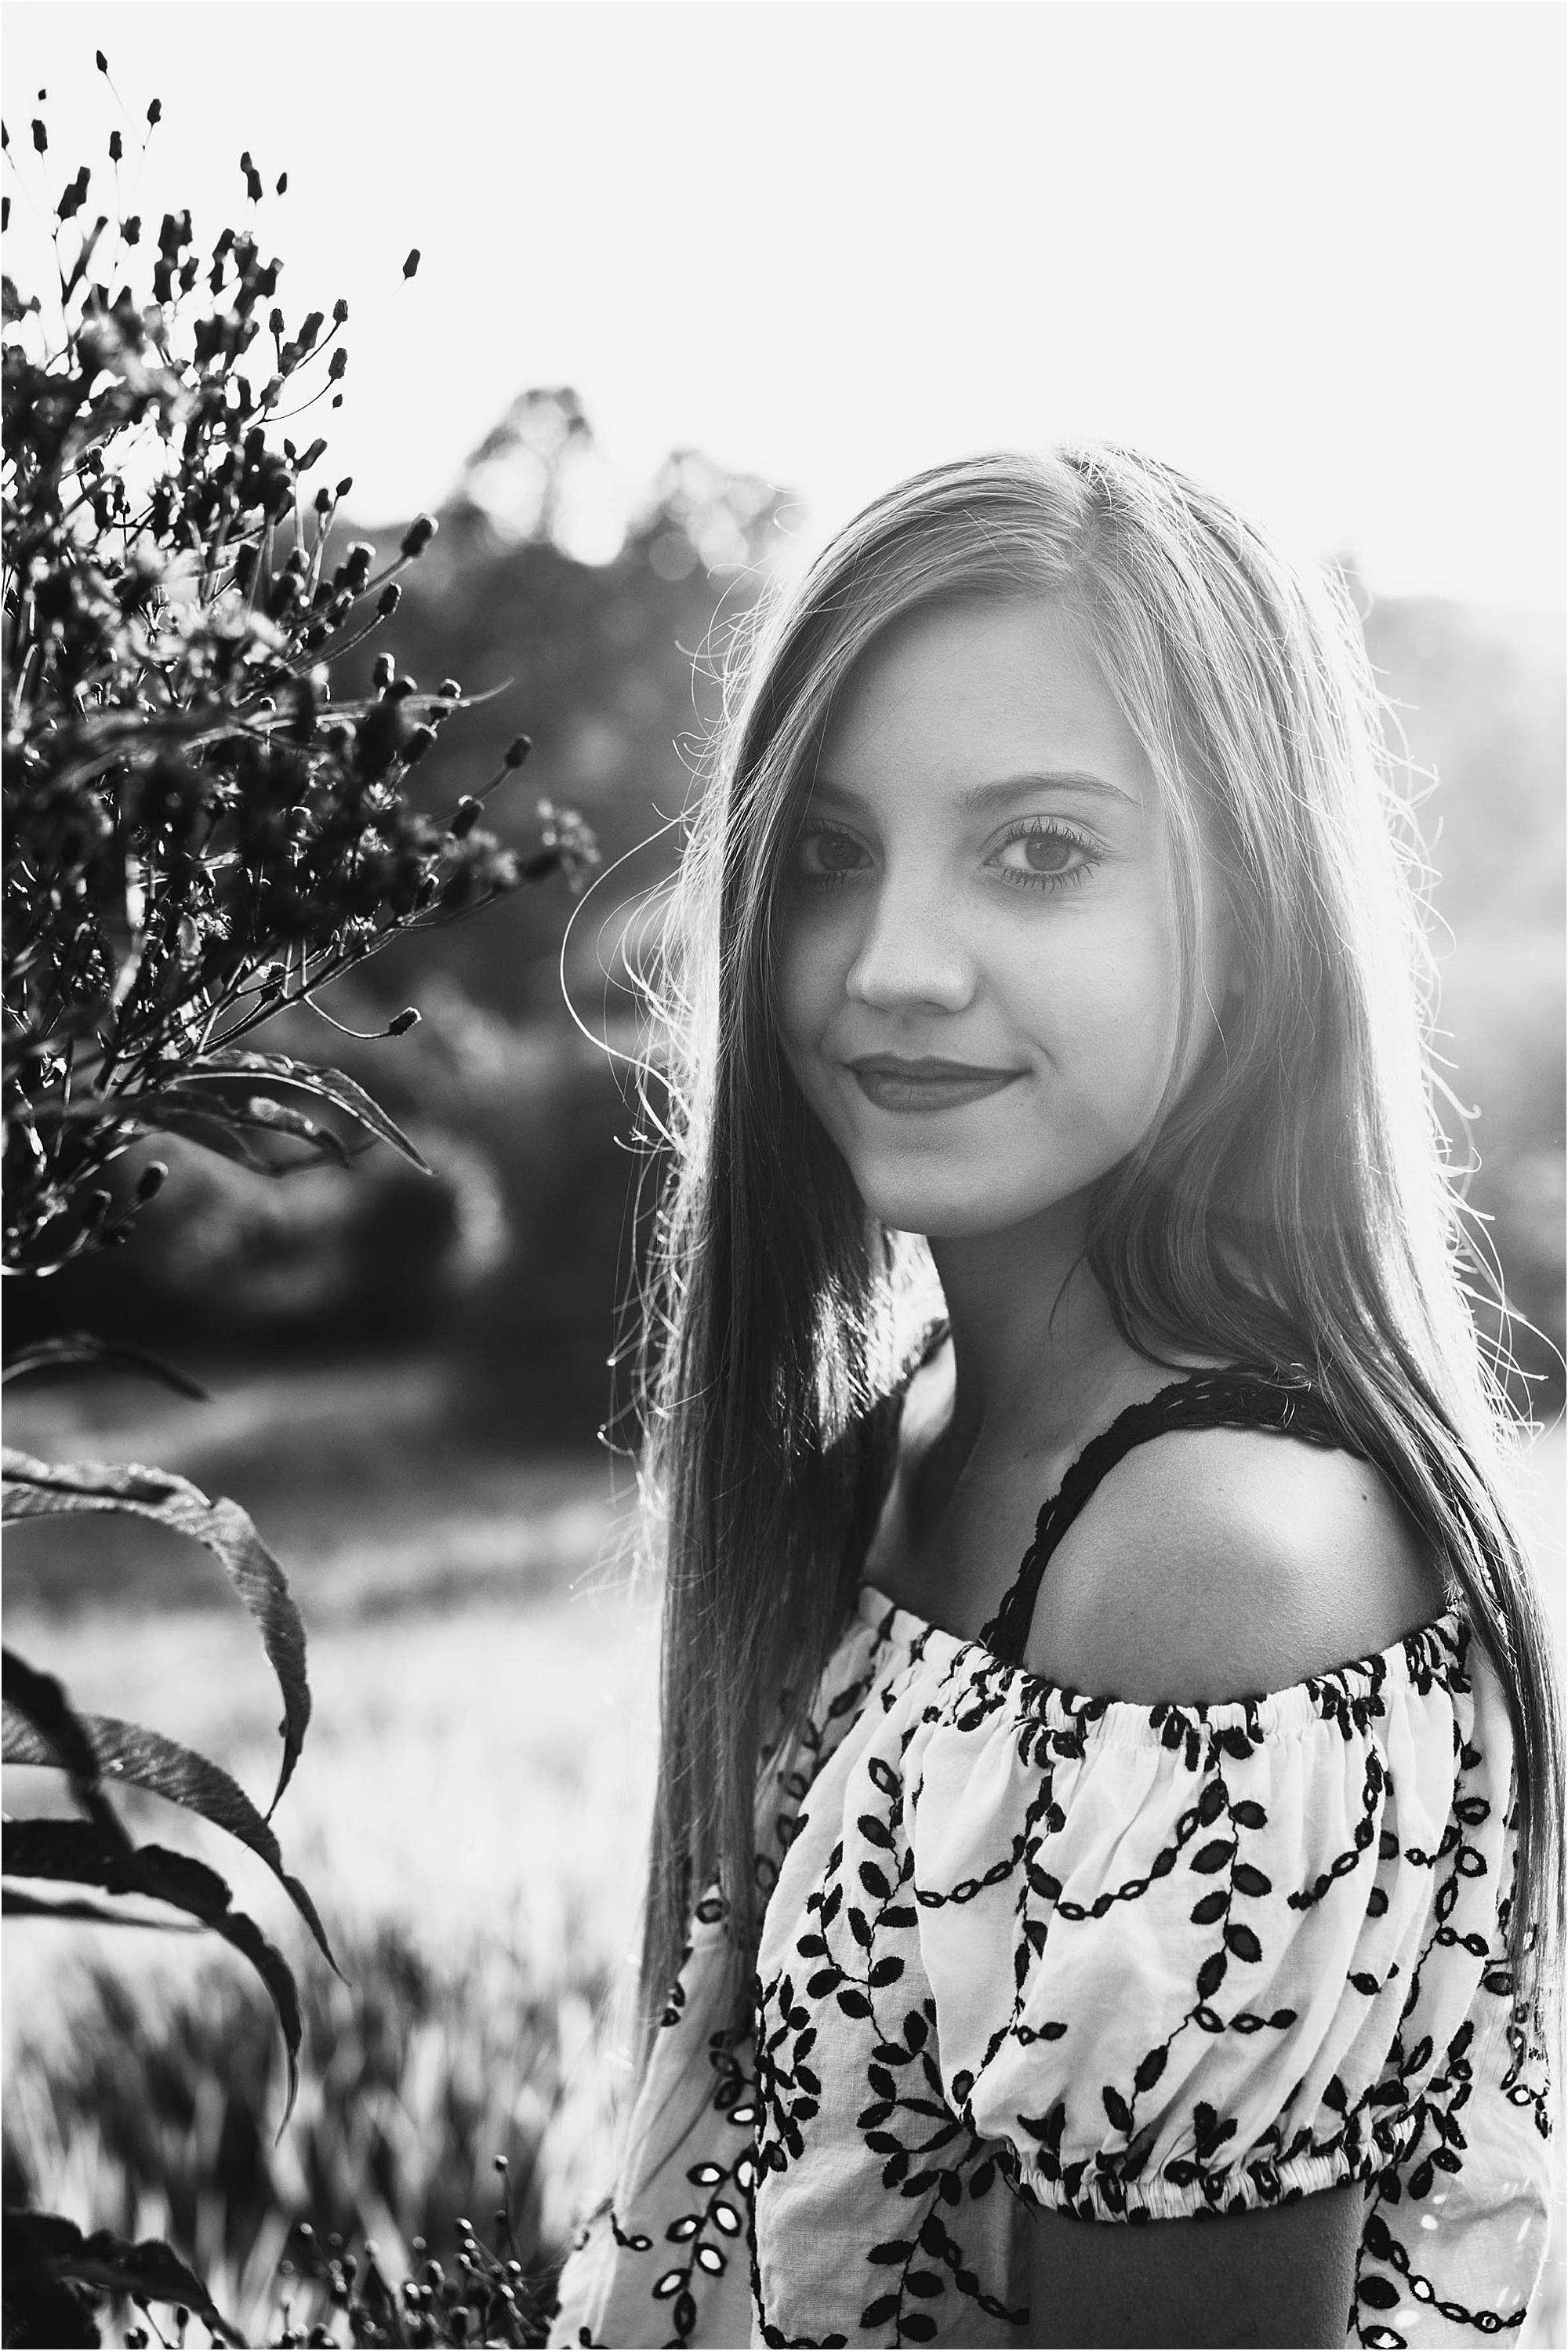 jamie_leonard_photography_family_kids_seniors_youngwood_women_ligonier_mount_pleasant_pa_family_photographer_studio_pittsburgh.jpg